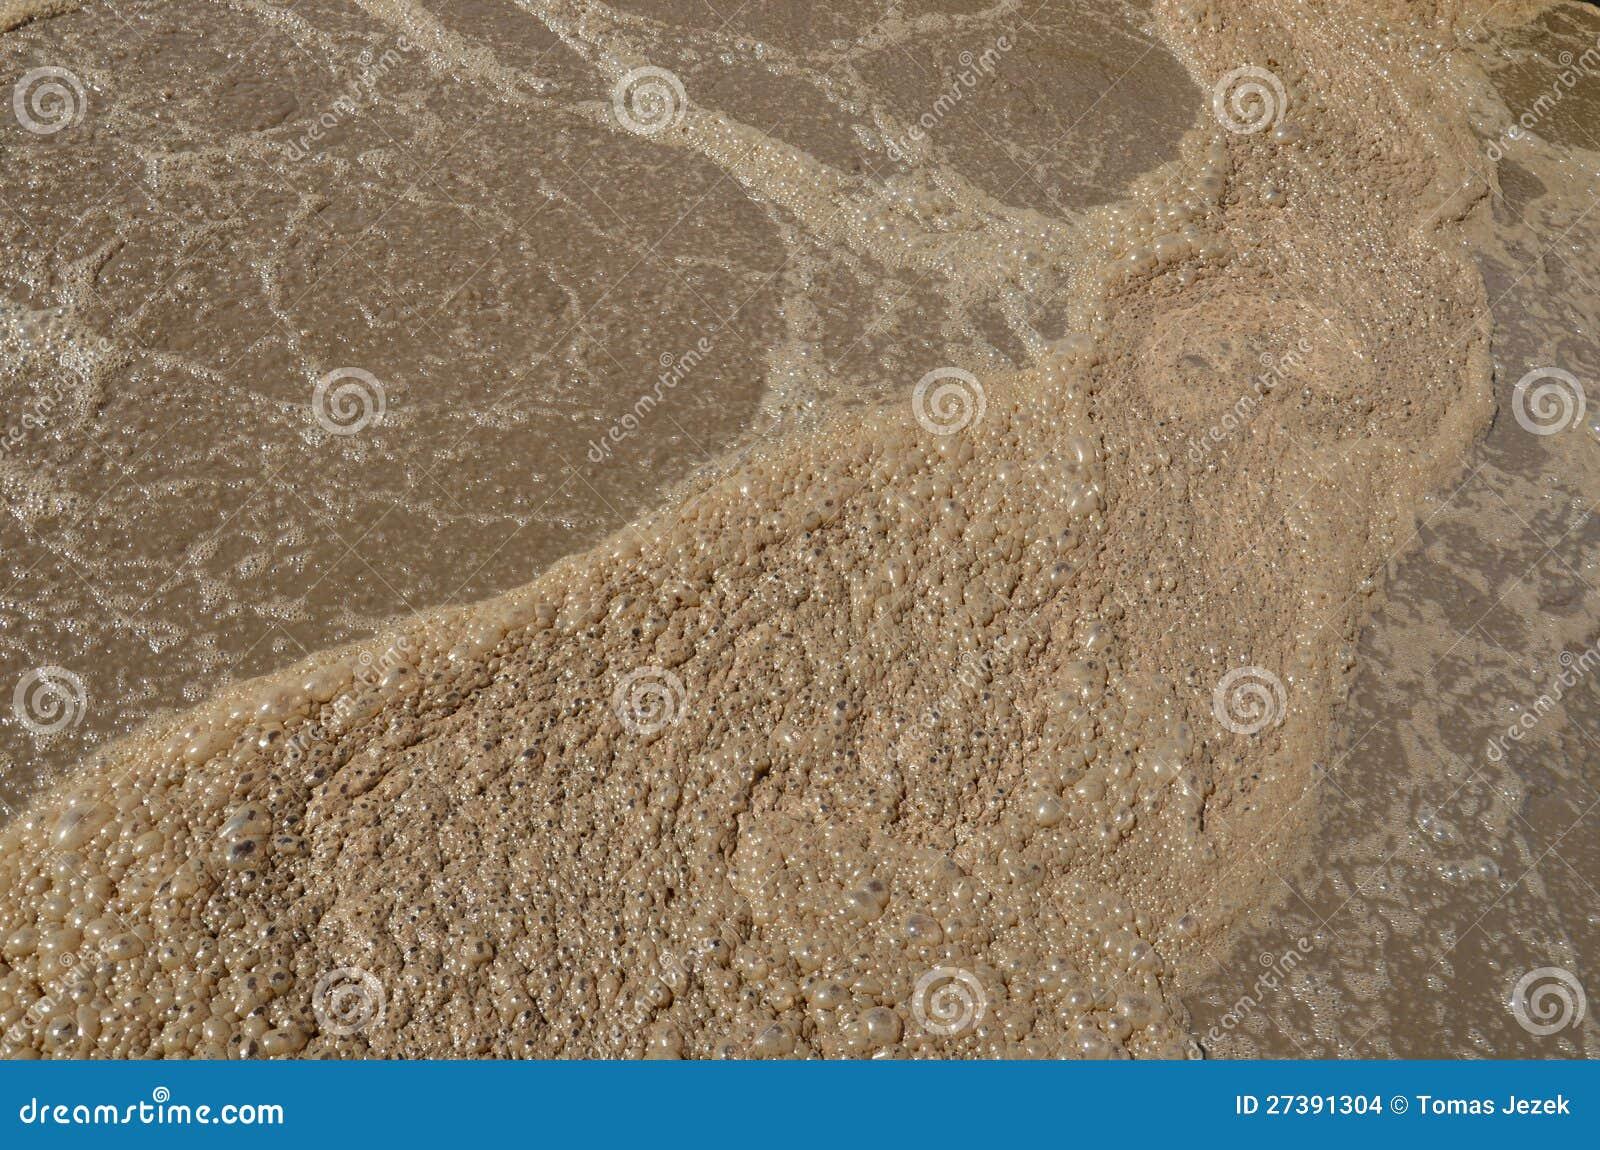 Water treatment sludge